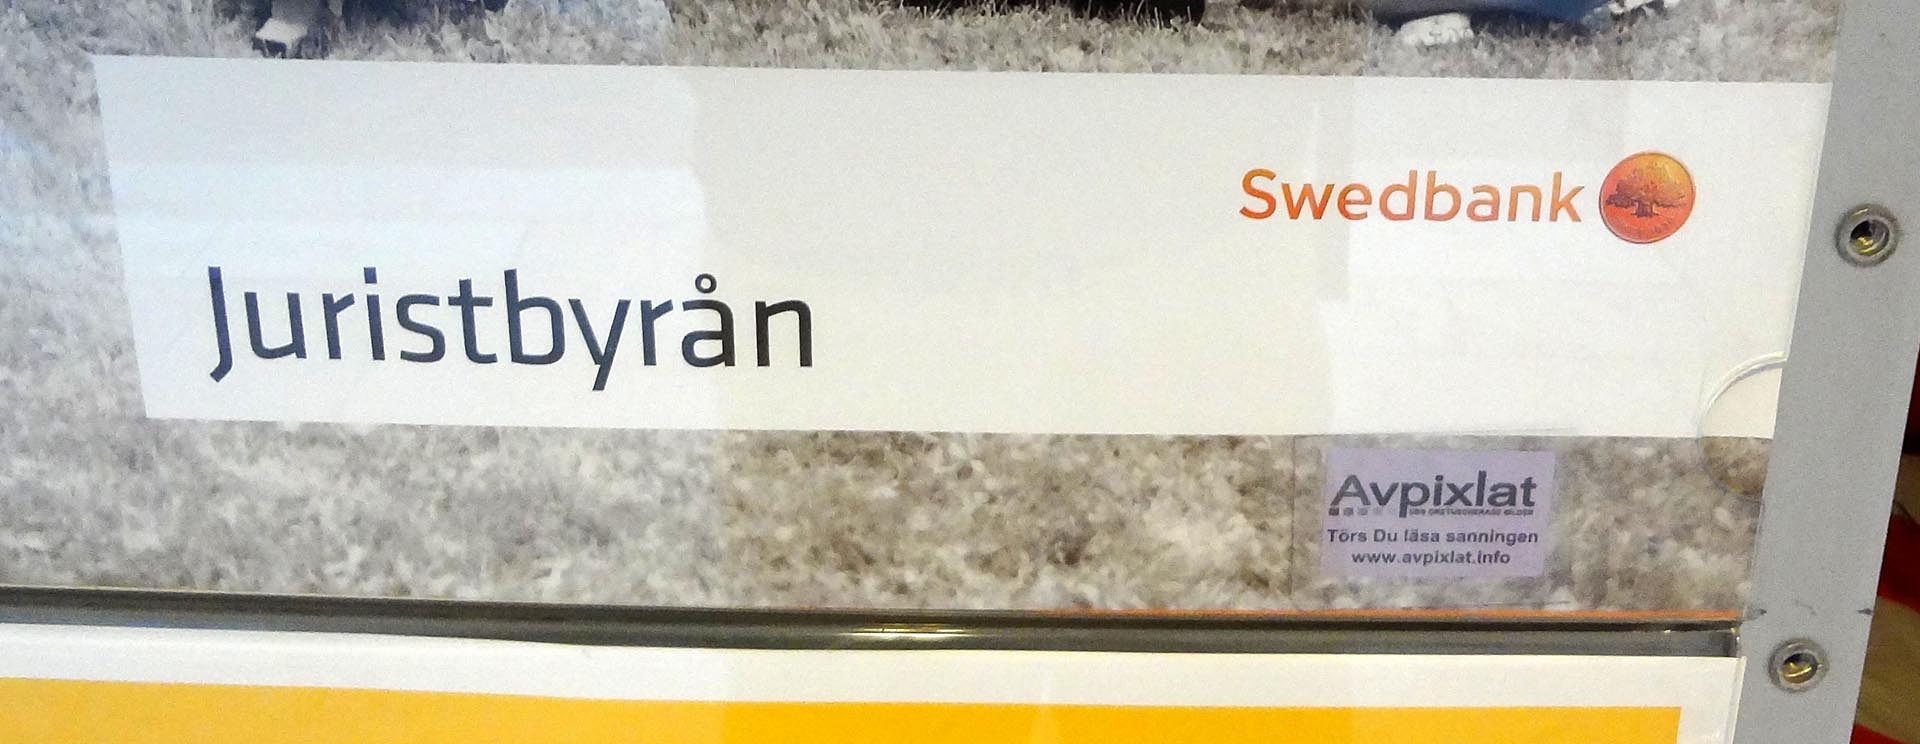 juristbyrån swedbank